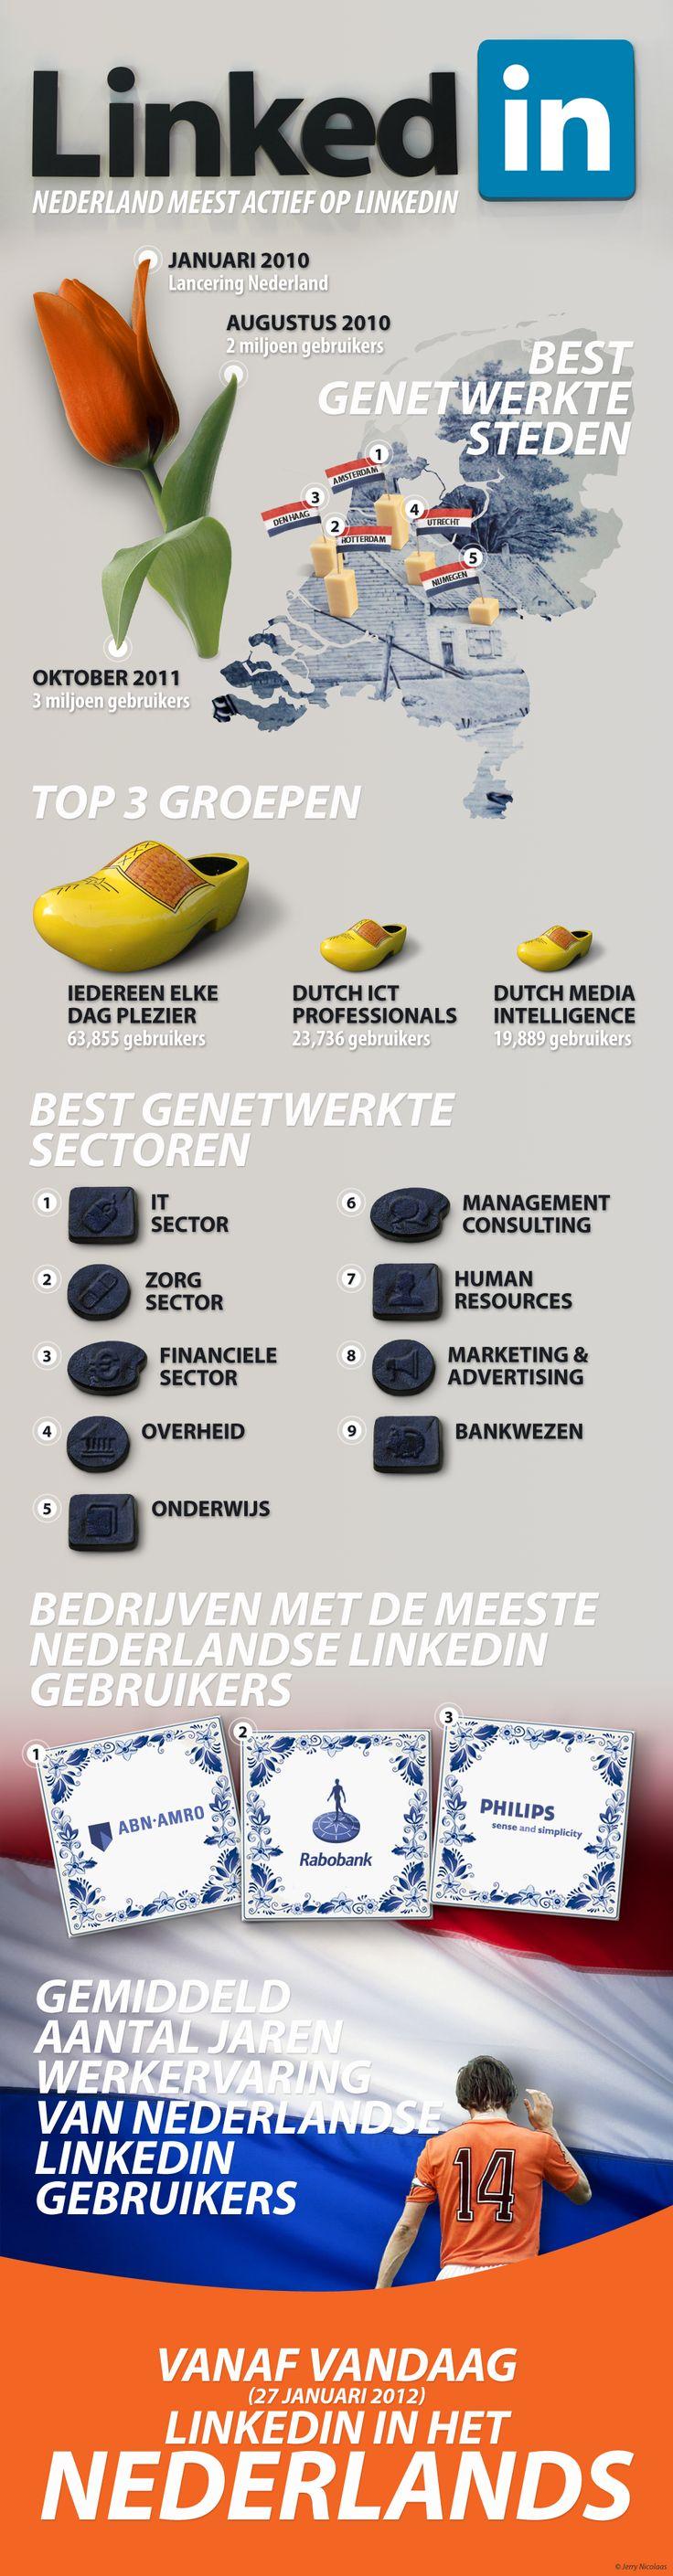 LinkedIn op klompen | Nederland, NL | Linkedin | Pinterest